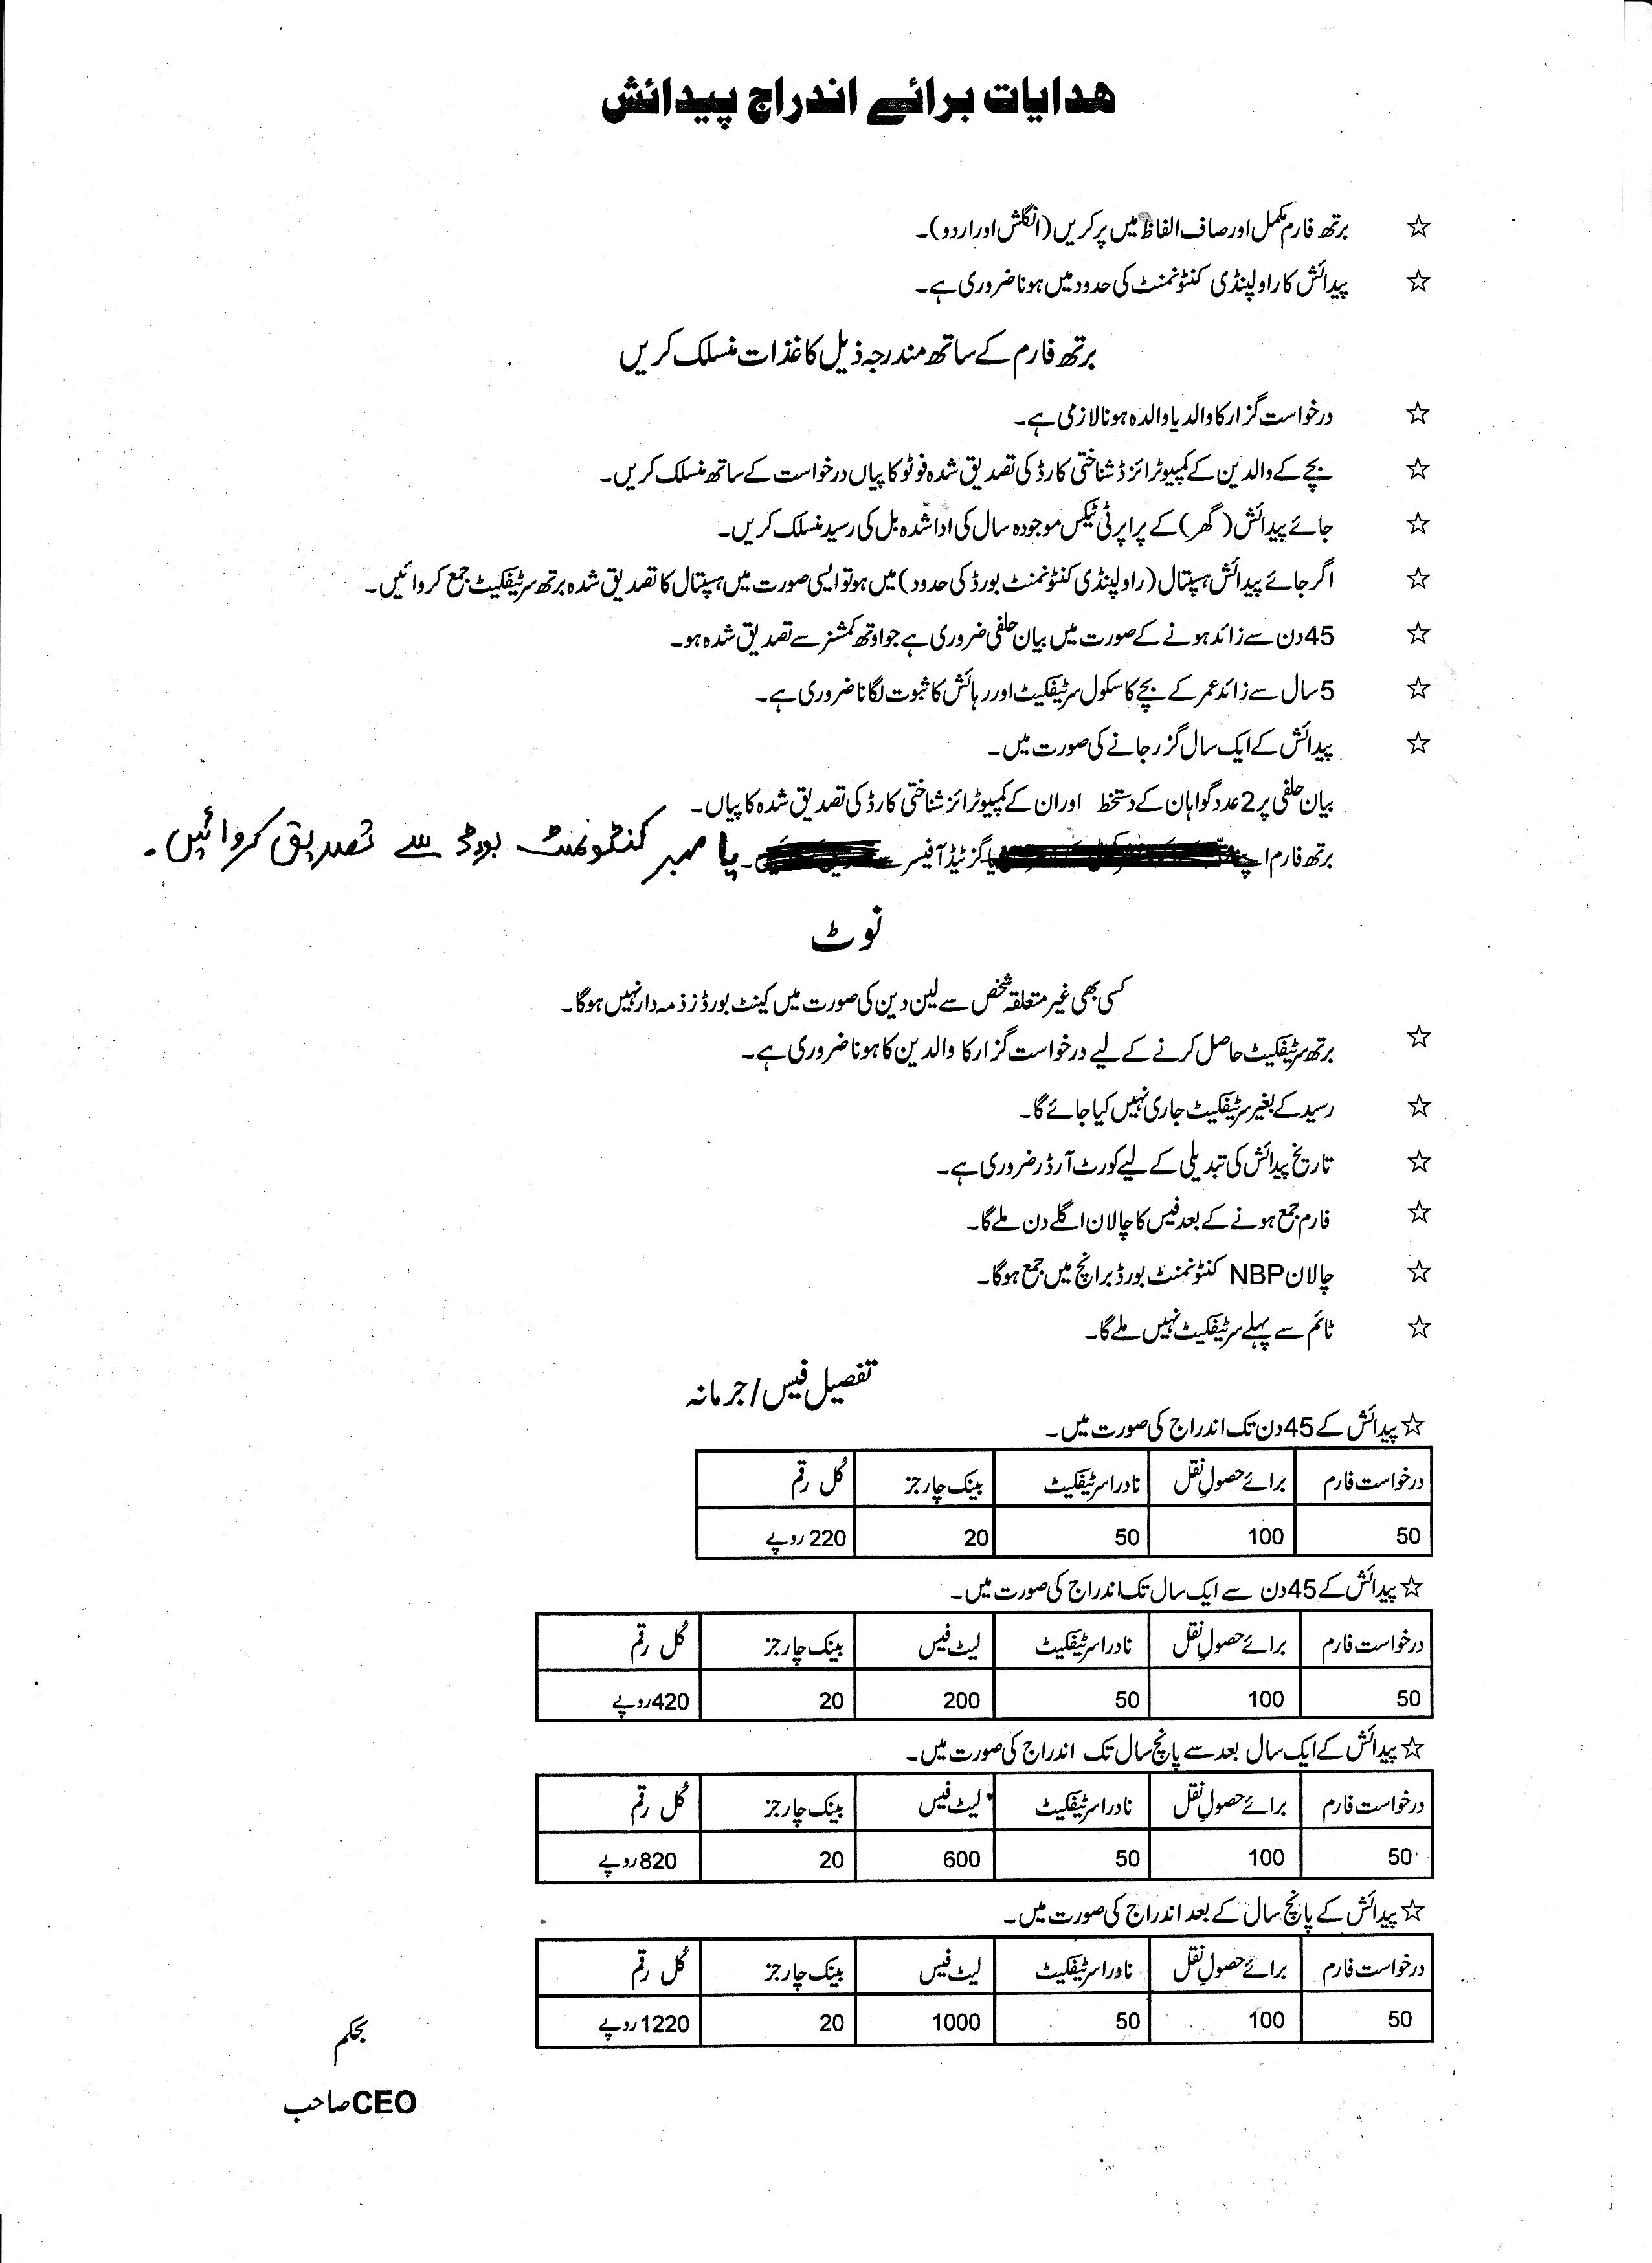 Nadra Birth Certificate Form Download Pdf